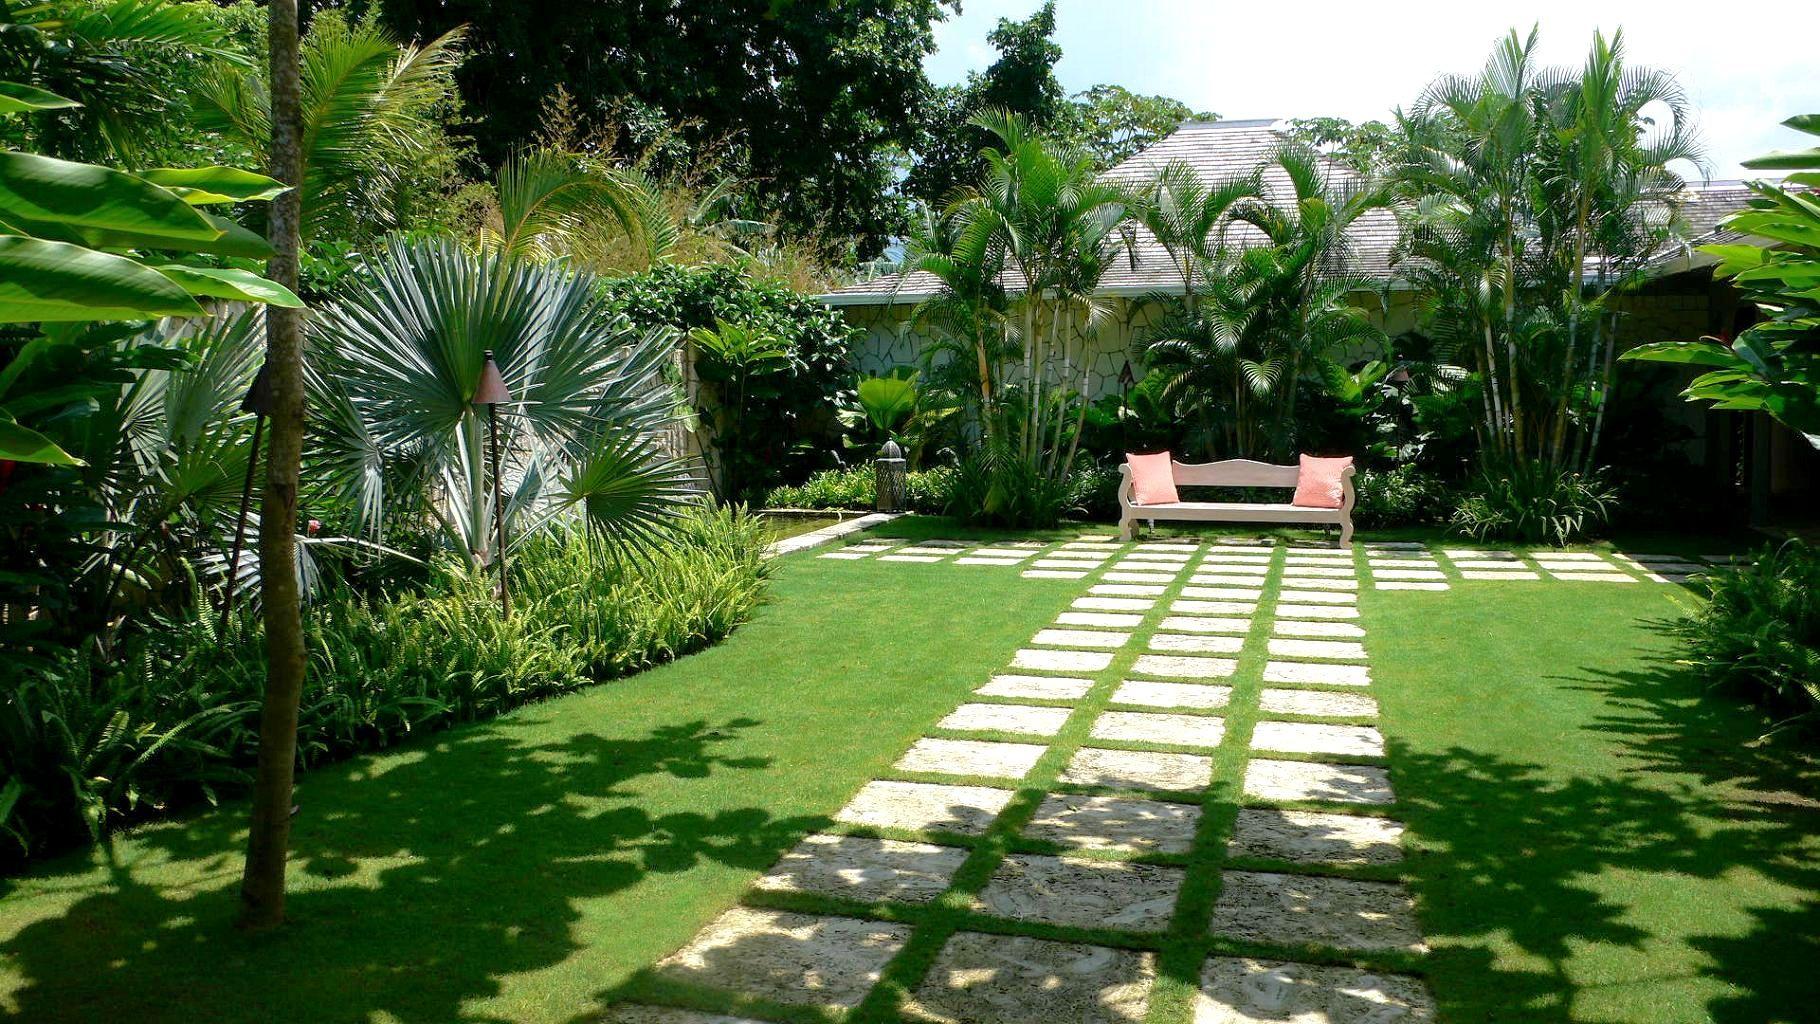 Landscaping Ideas For Small Yards Ontario Garden Design Landscape Garden Idea Jardines Modernos Jardines Diseno De Jardin Backyard garden ideas ontario